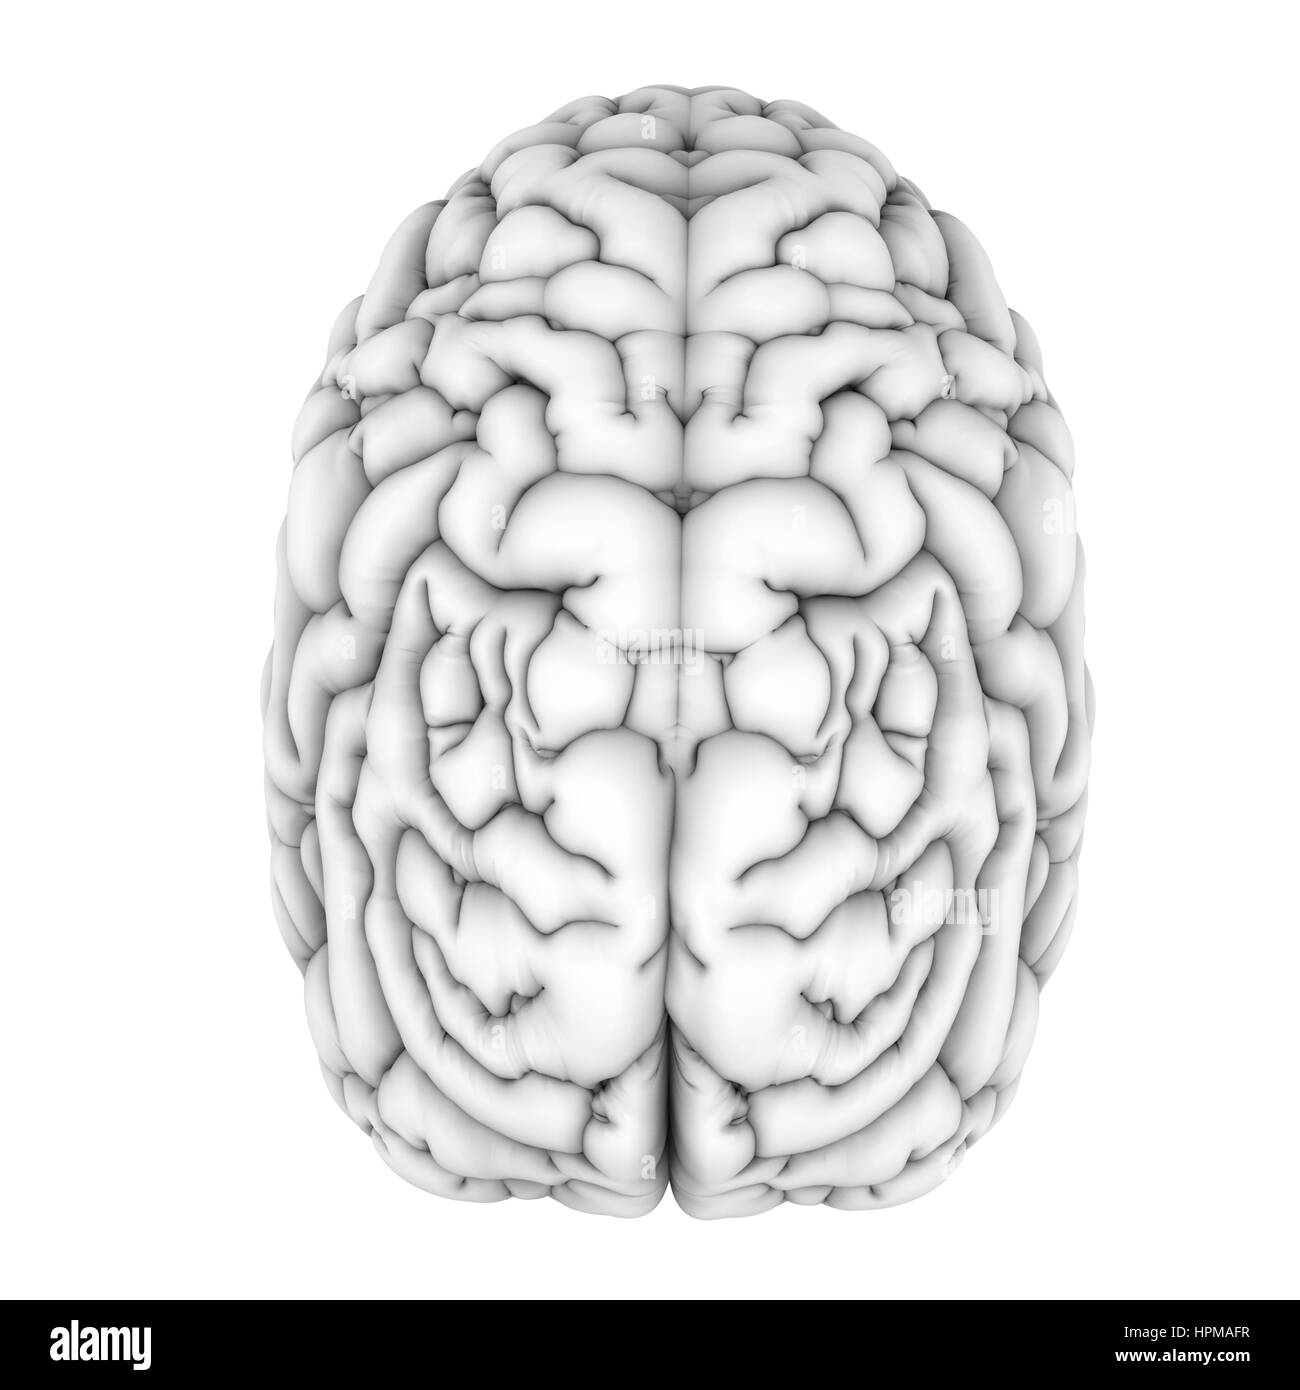 Großzügig 3d Gehirn Anatomie Interaktiv Ideen - Anatomie Ideen ...